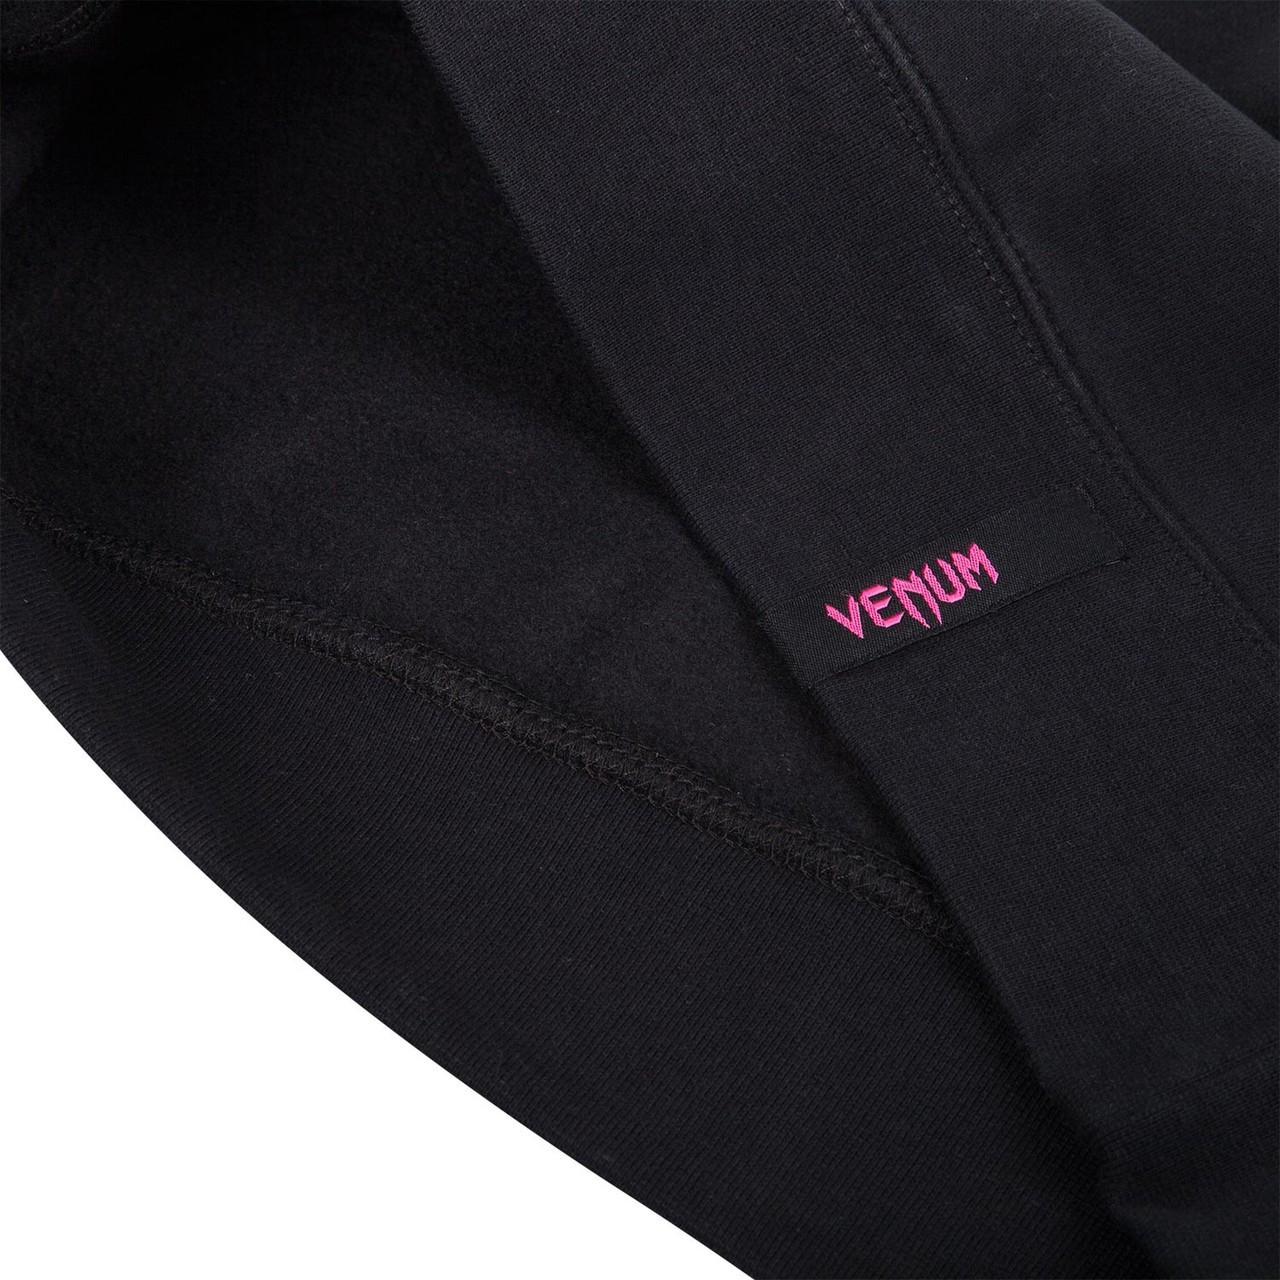 Venum Infinity Hoody - Black/Pink now available at www.thejiujitsushop.com  Free Shipping from The Jiu Jitsu Shop.